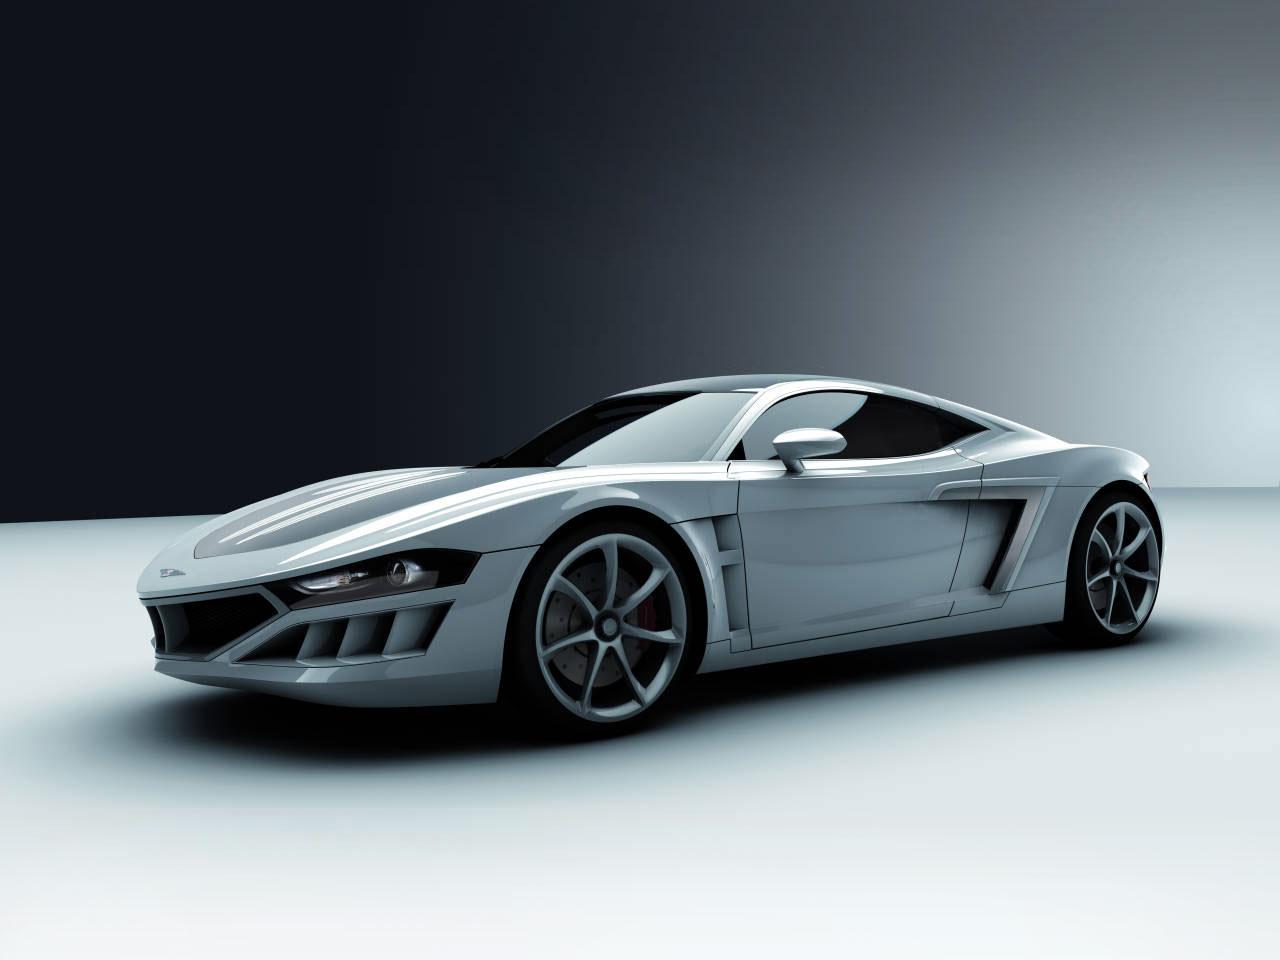 labels automotive design car car design hispano suiza v10 supercharged